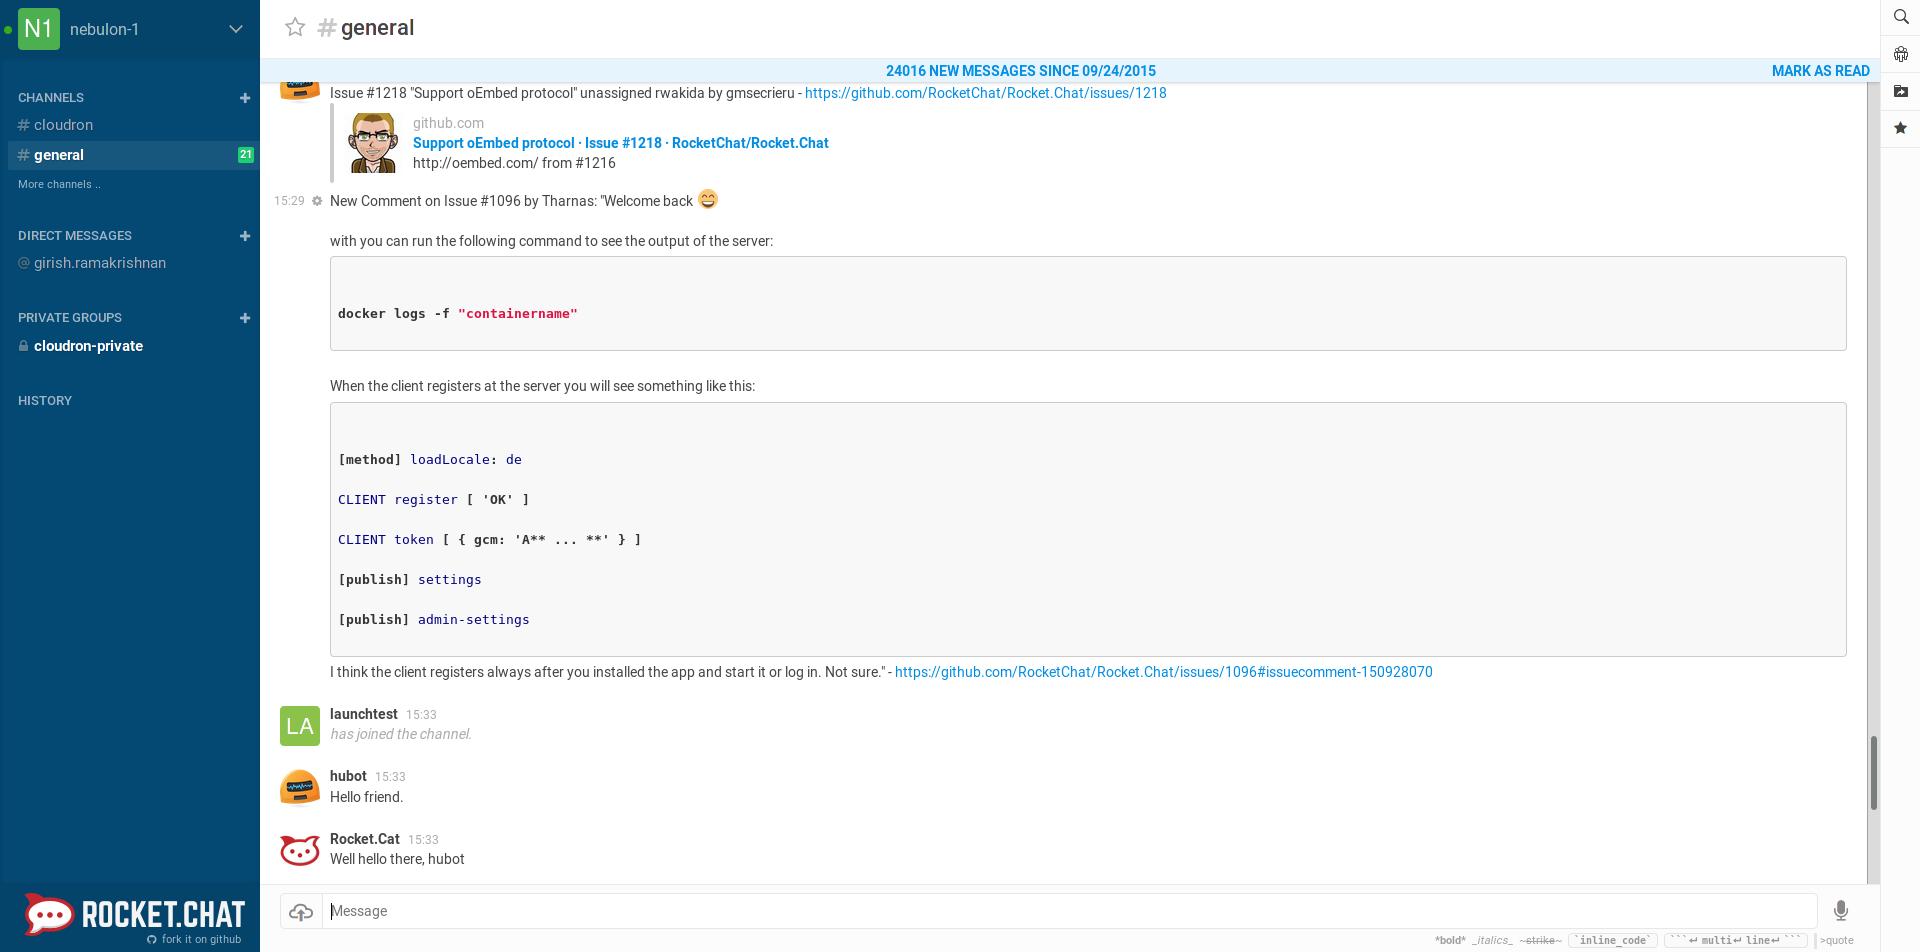 Rocket.Chat Screenshot 2